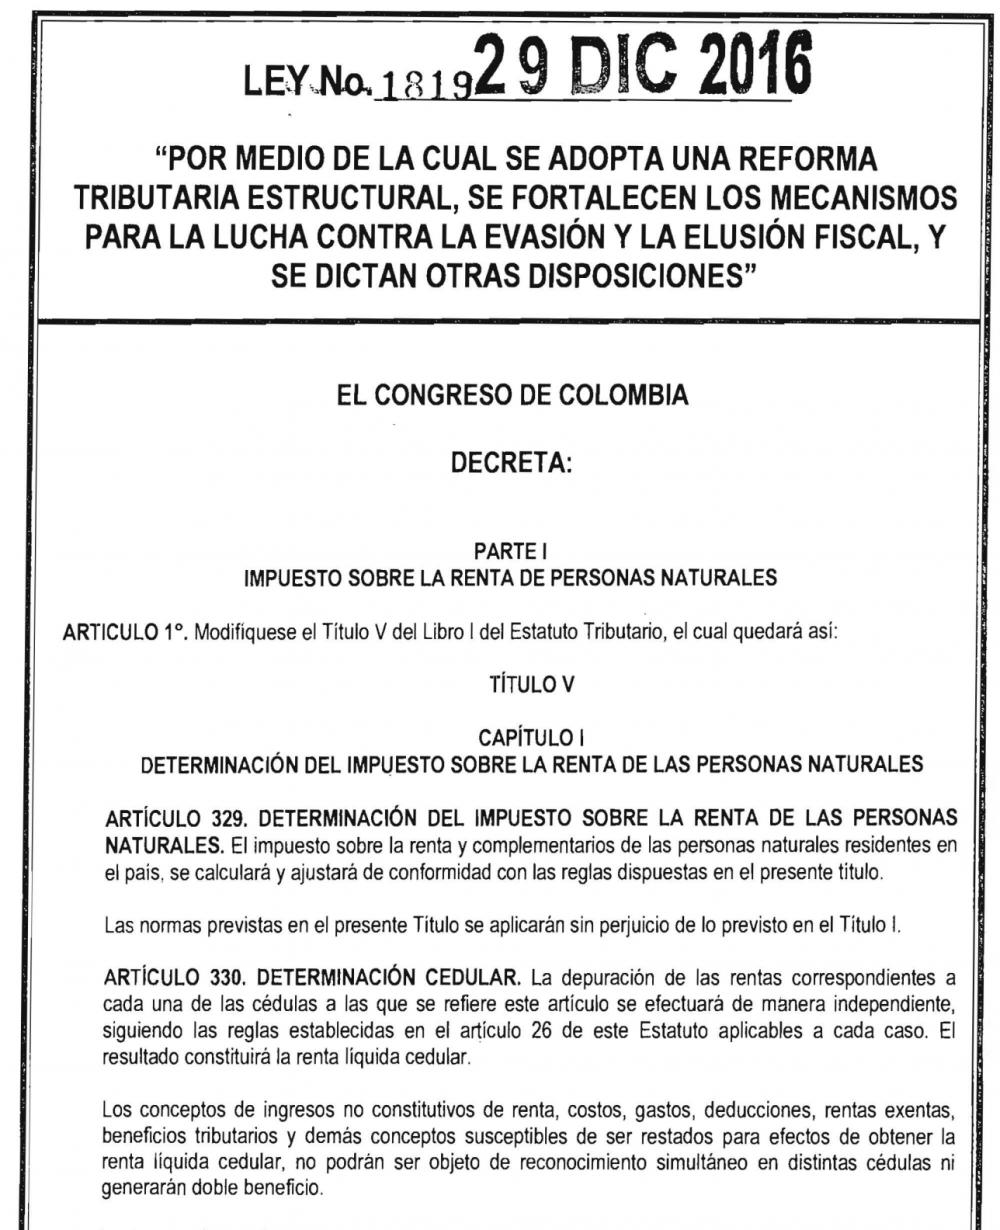 reforma tributaria Colombia 2016